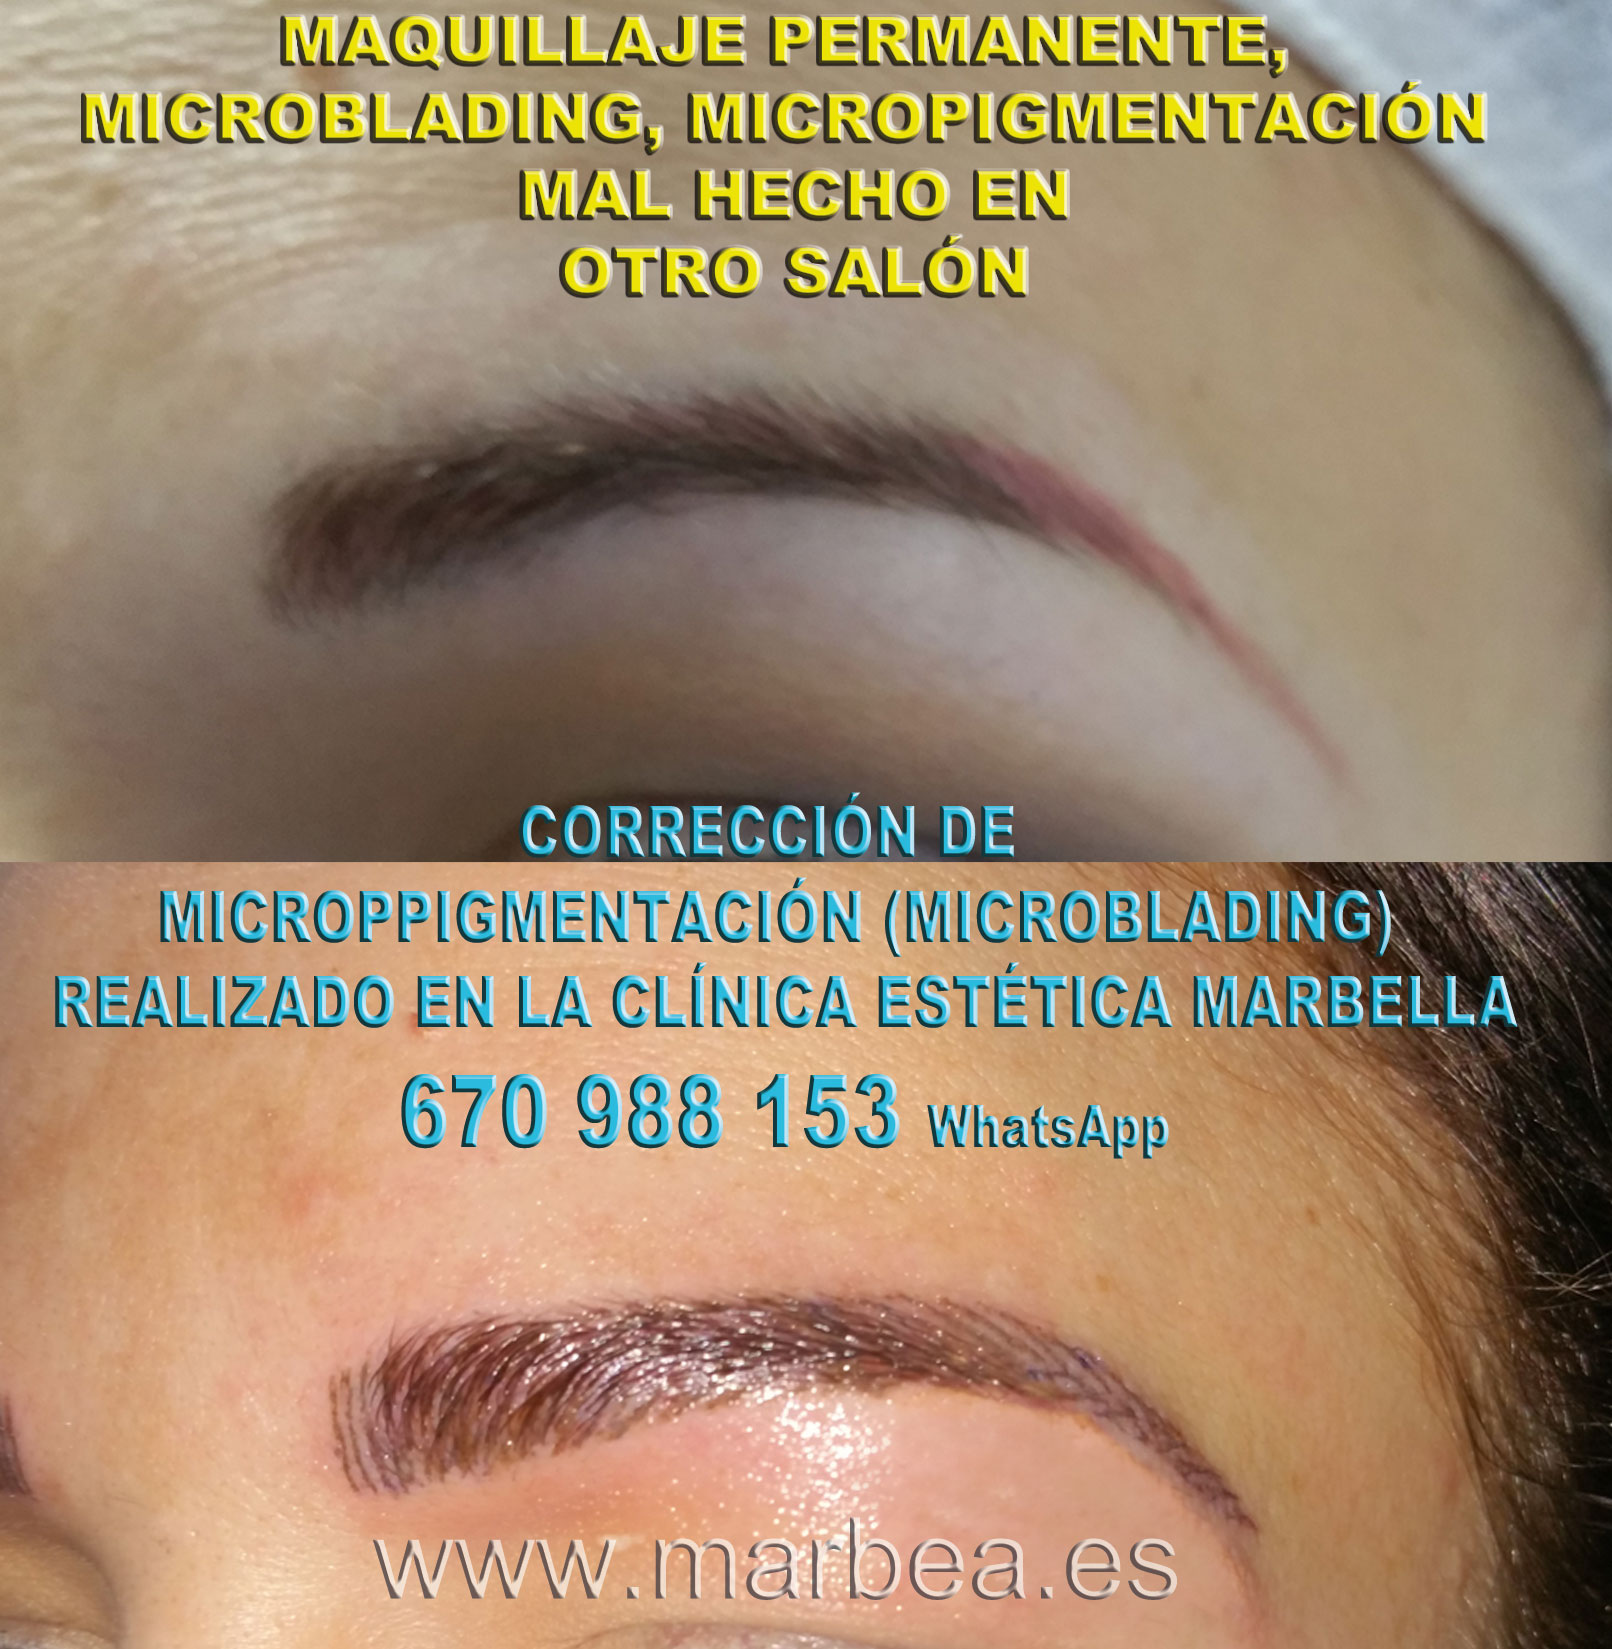 ELIMINAR TATUAJE CEJAS clínica estética tatuaje entrega corrección de micropigmentación en cejas,corregir micropigmentación no deseada